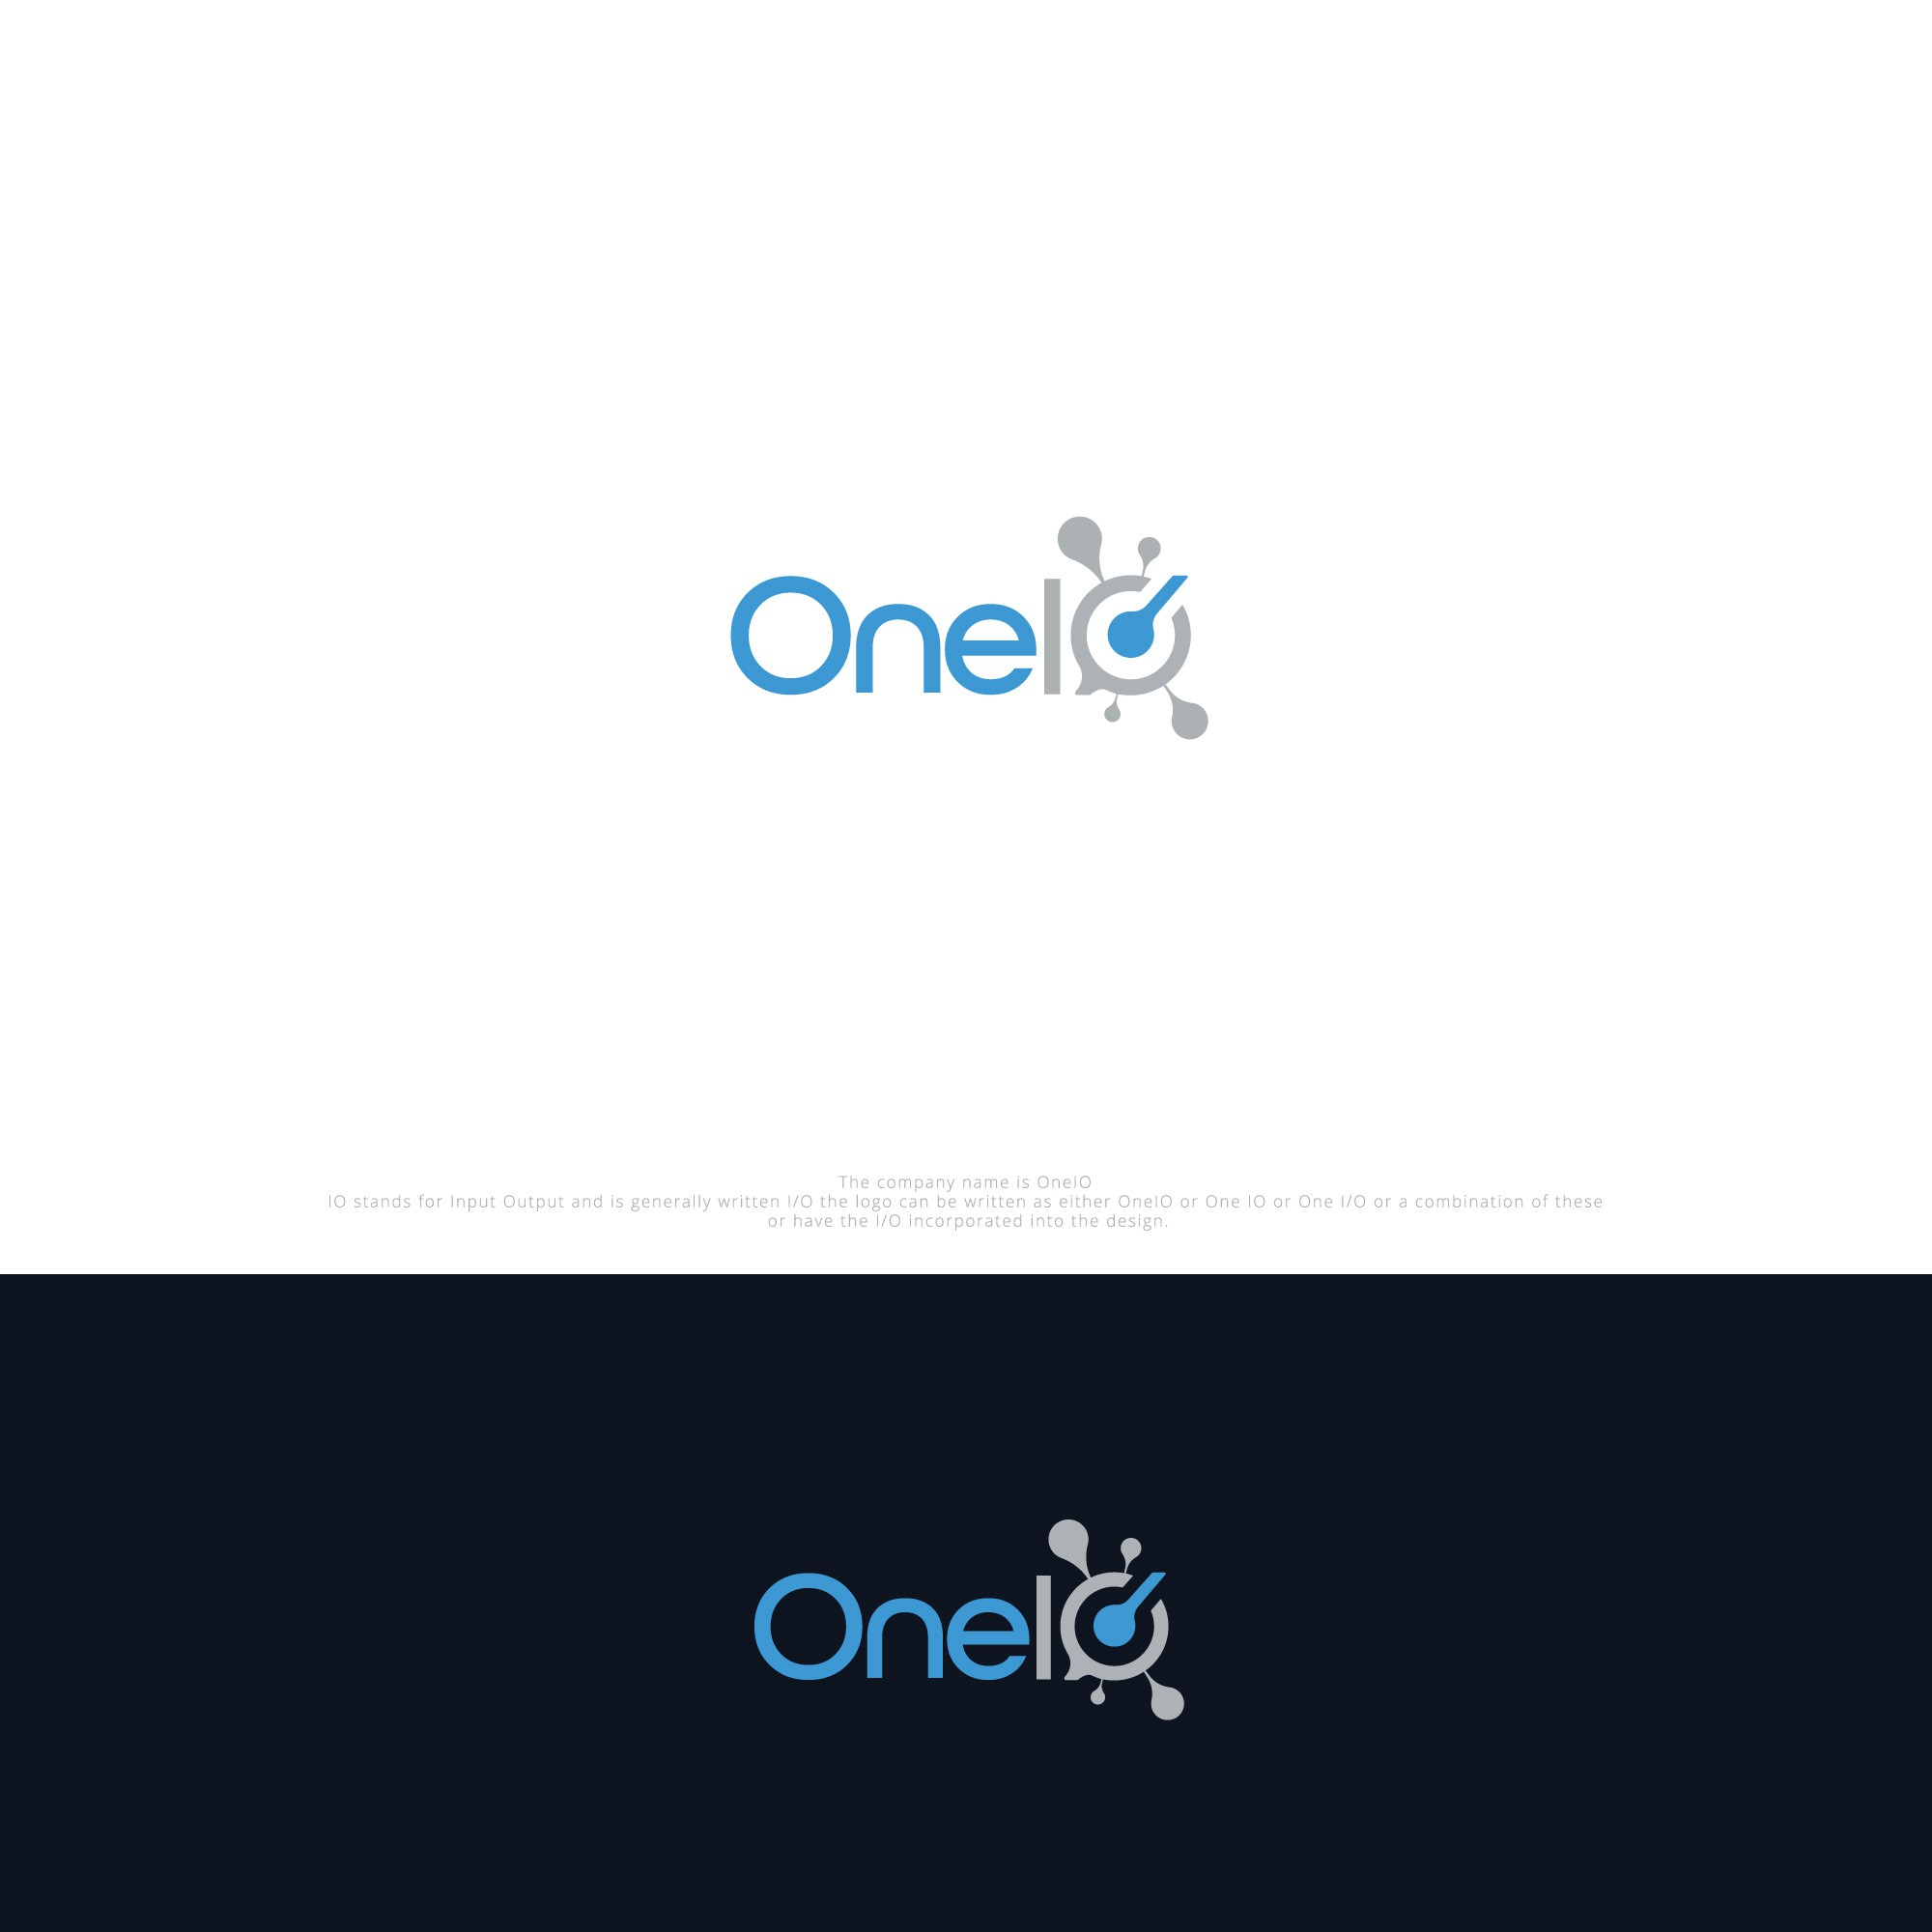 Create the logo for OneIO